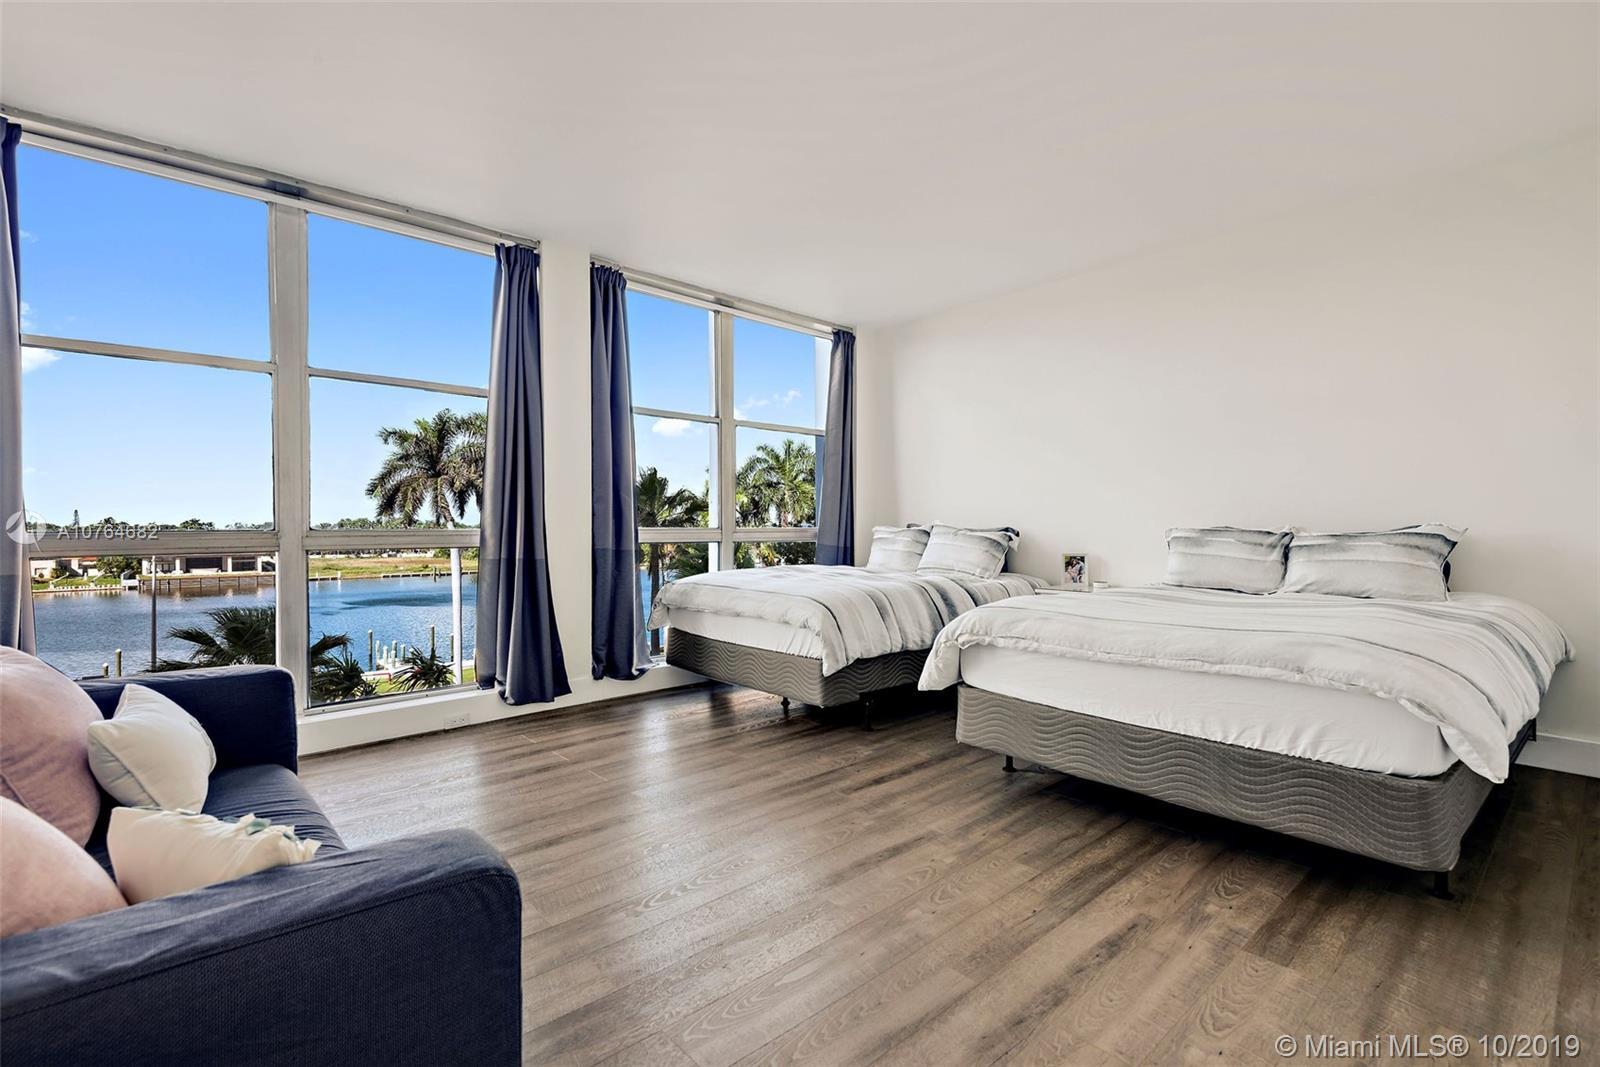 Photo of Crystal House Condominium Apt 4M